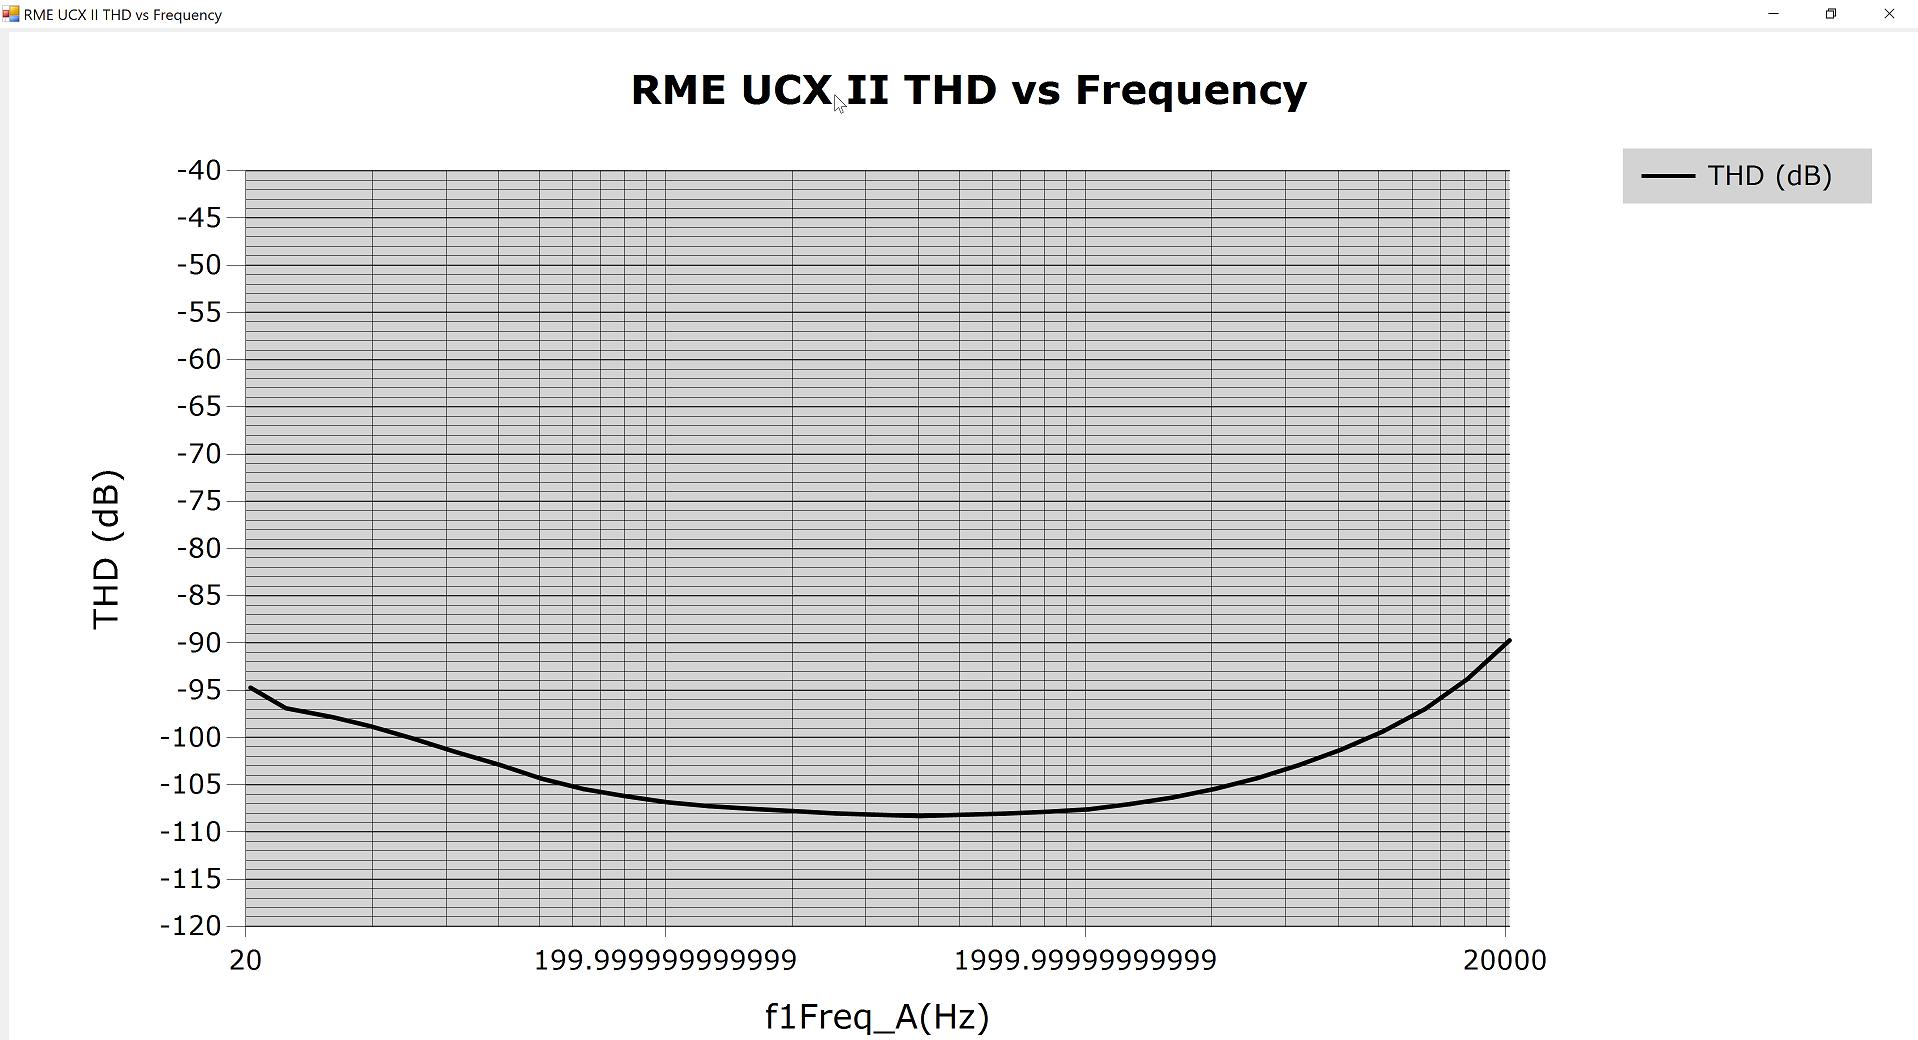 RME UCX II THD vs Freq 90kHz 5H.png